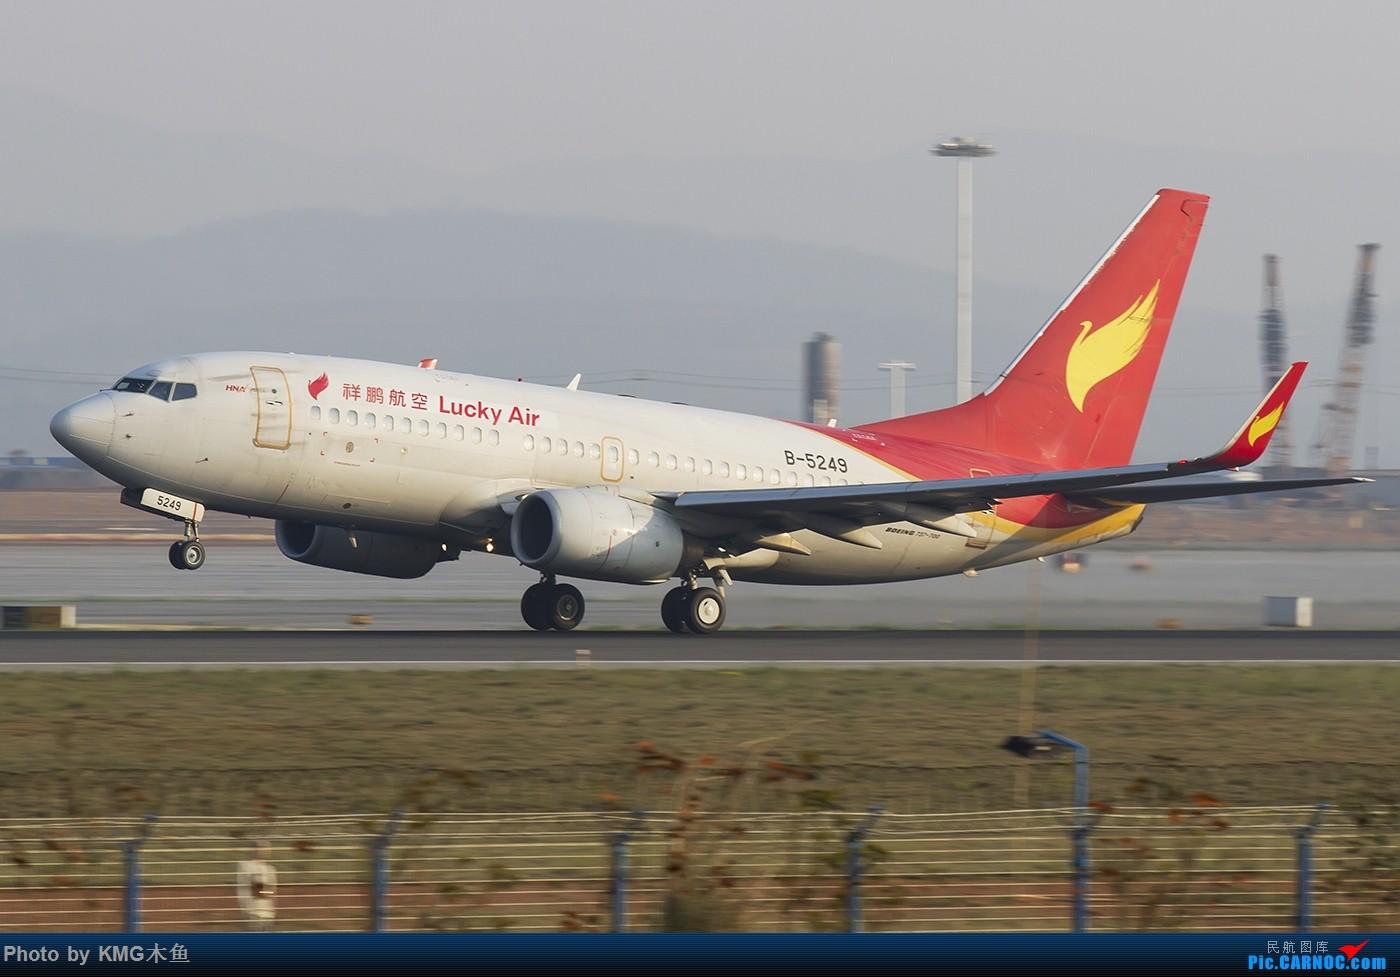 Re:[原创]【昆明飞友会—KMG木鱼】2016年4月的最后一天,去的很早,天气却不太好 BOEING 737-700 B-5249 中国昆明长水国际机场